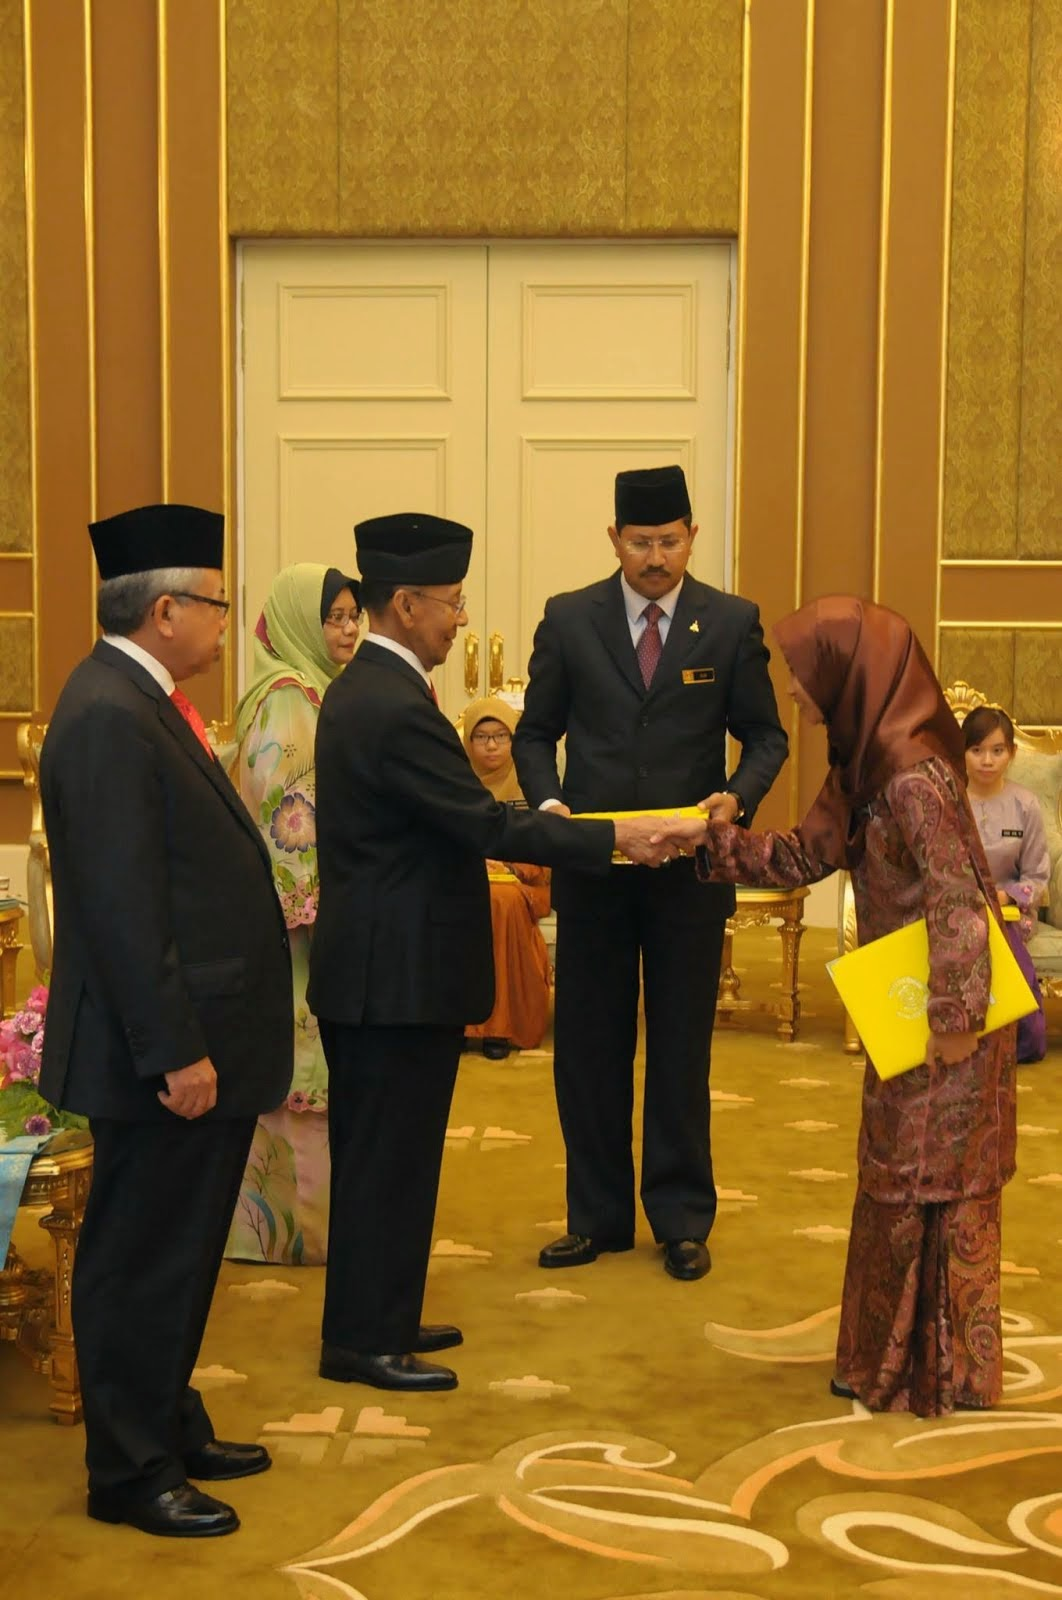 2013/2014 King's Scholar